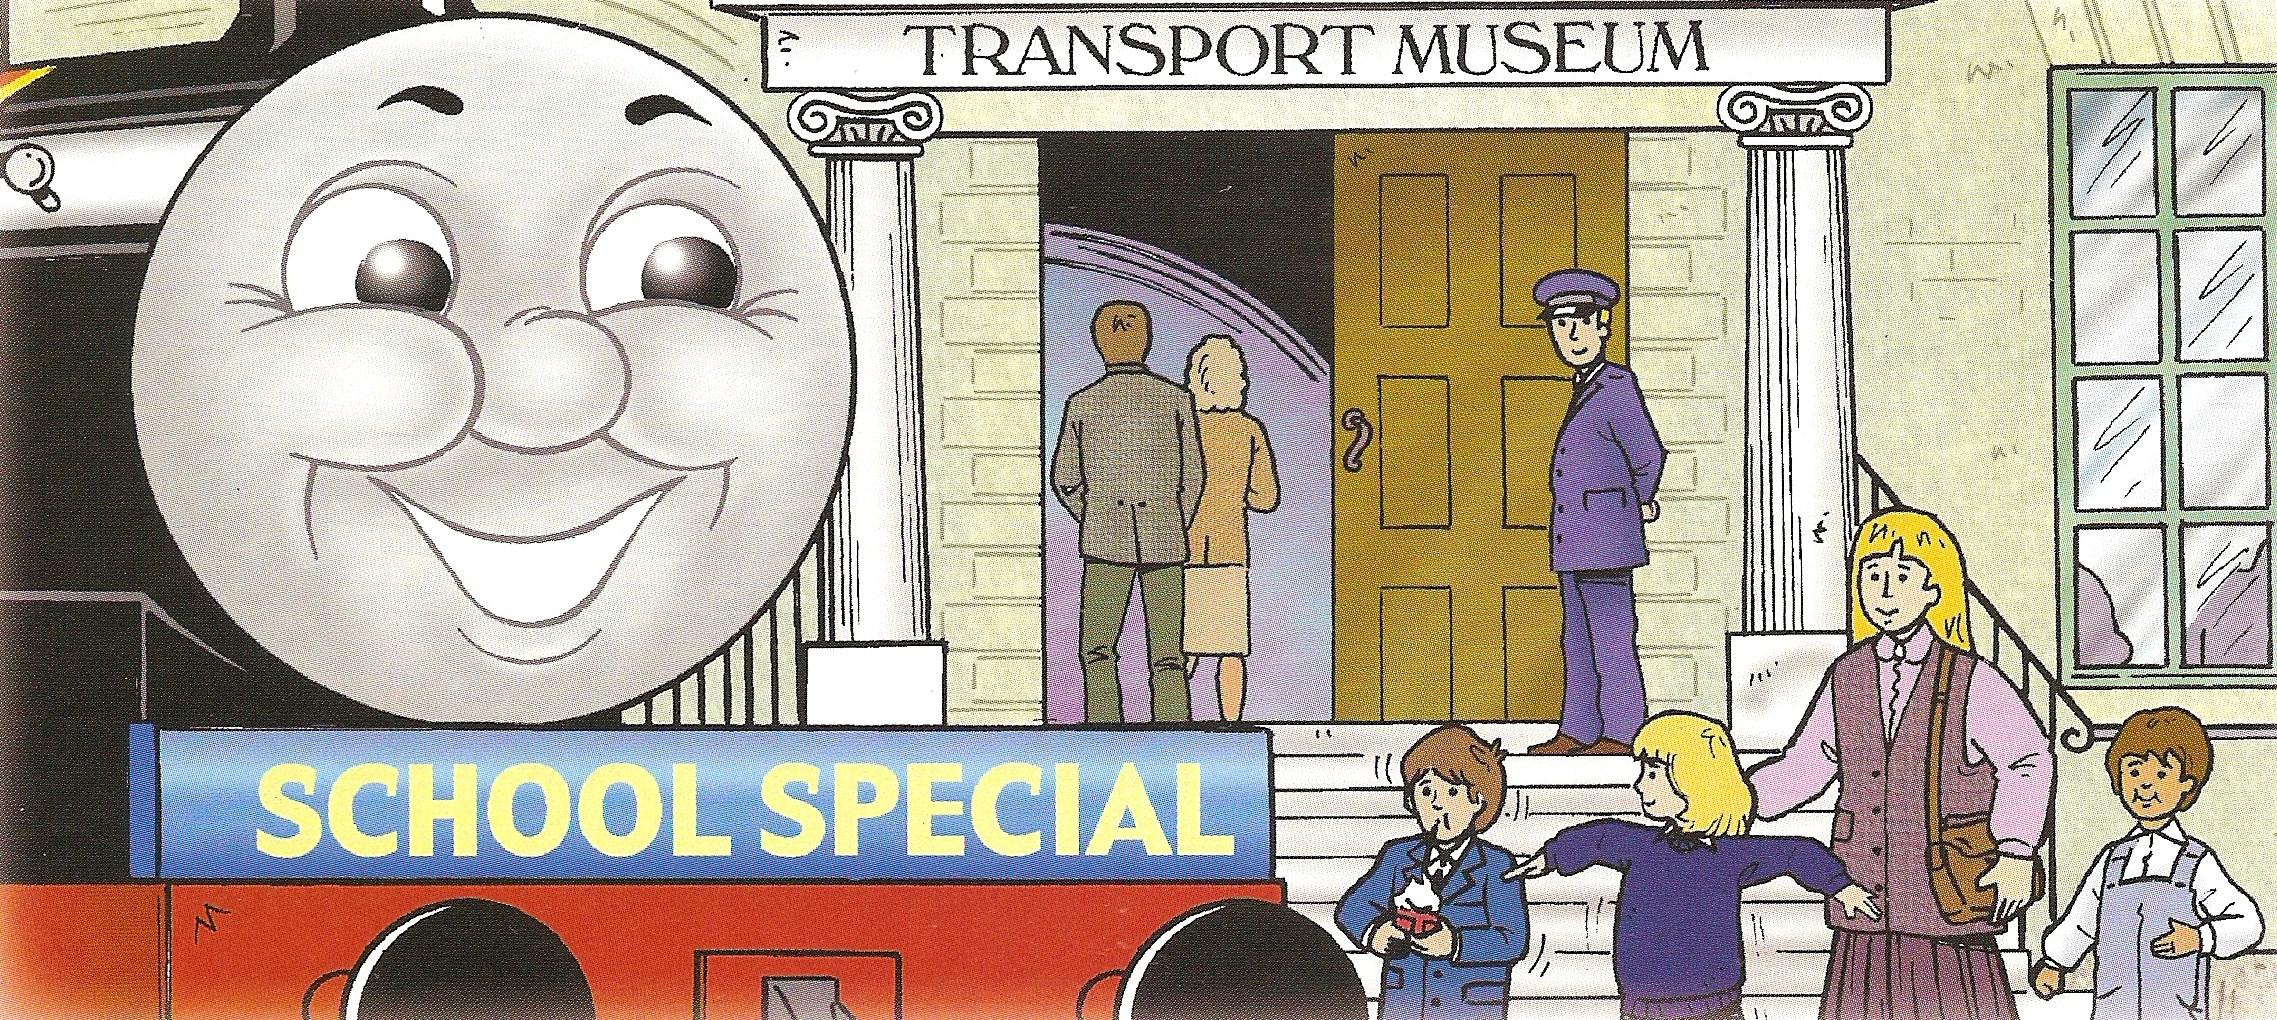 Sodor Transport Museum